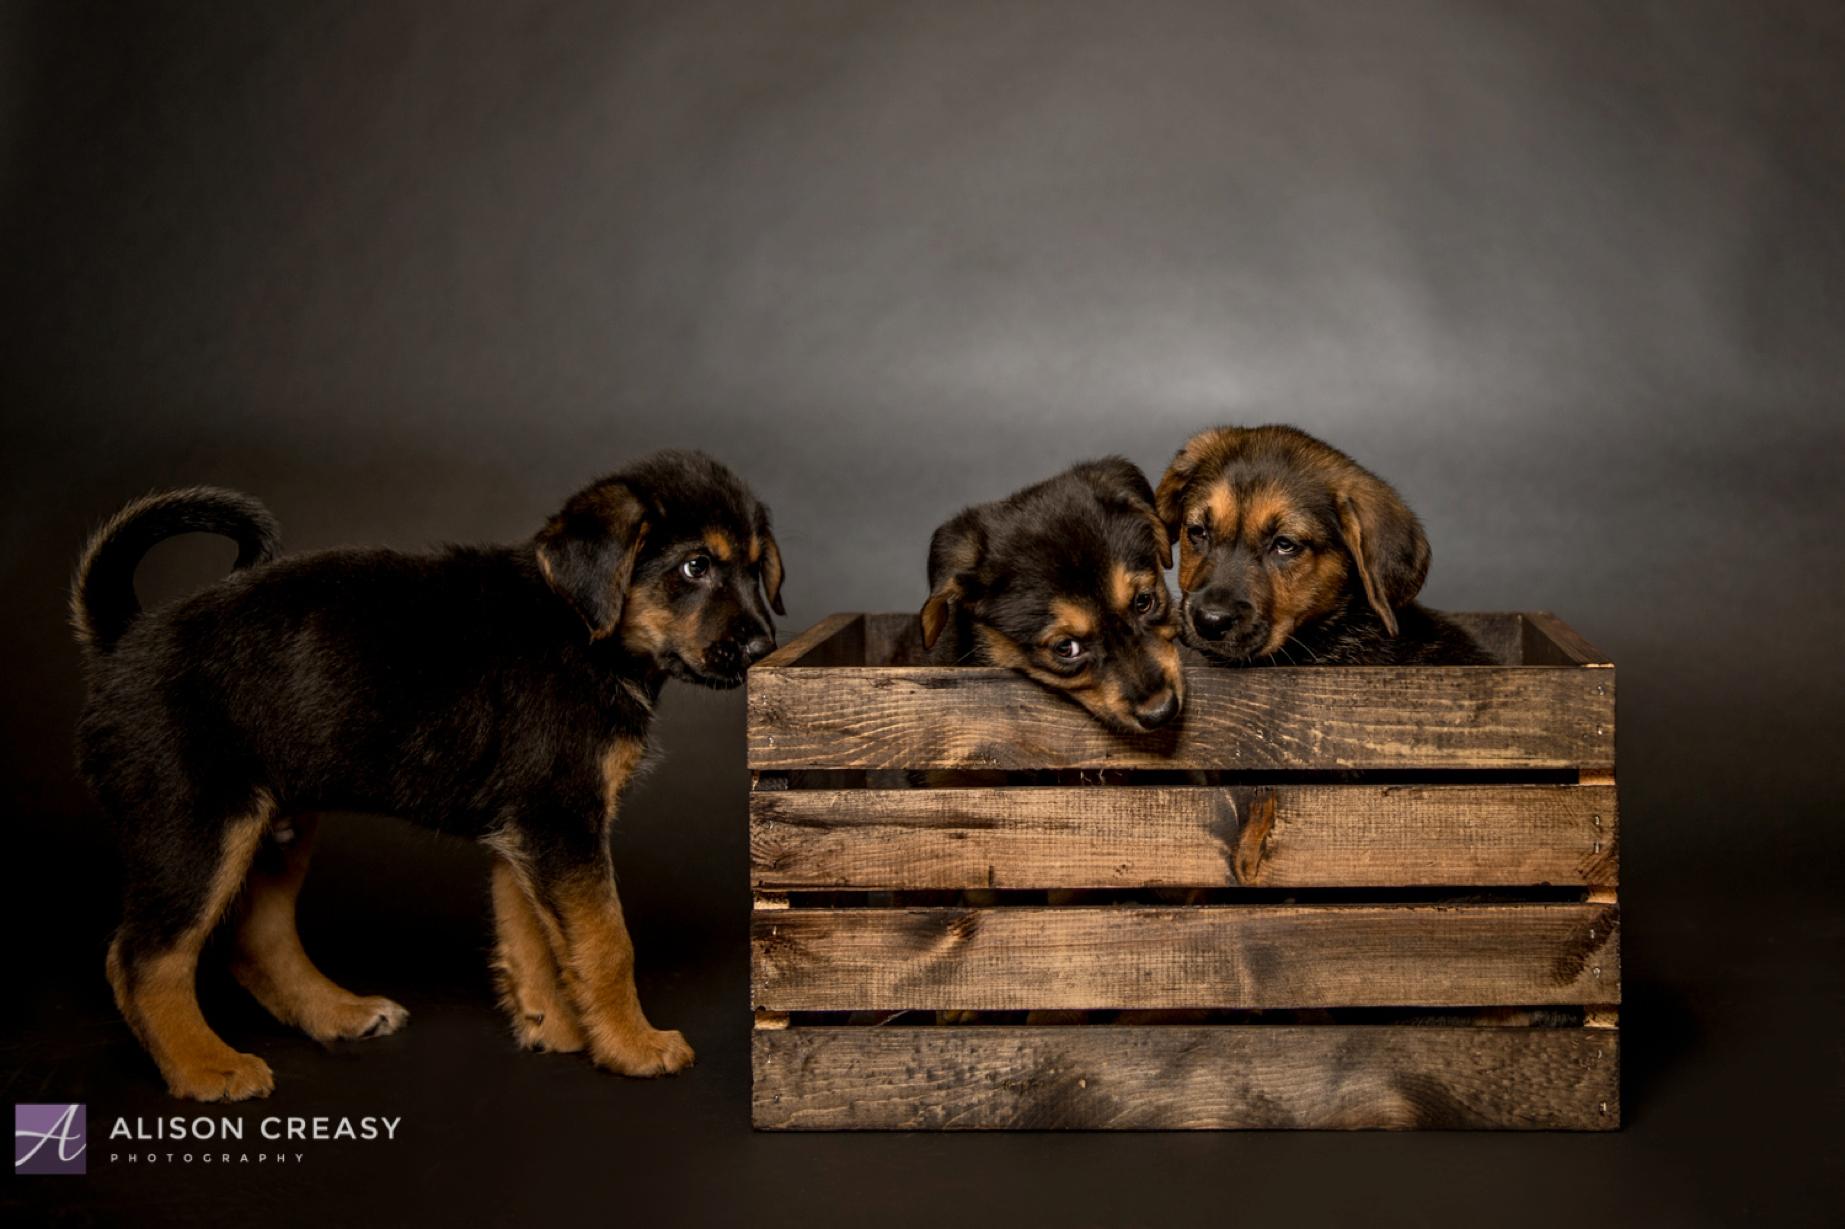 Alison-Creasy-Photography-Lynchburg-VA-Photographer_1041.jpg